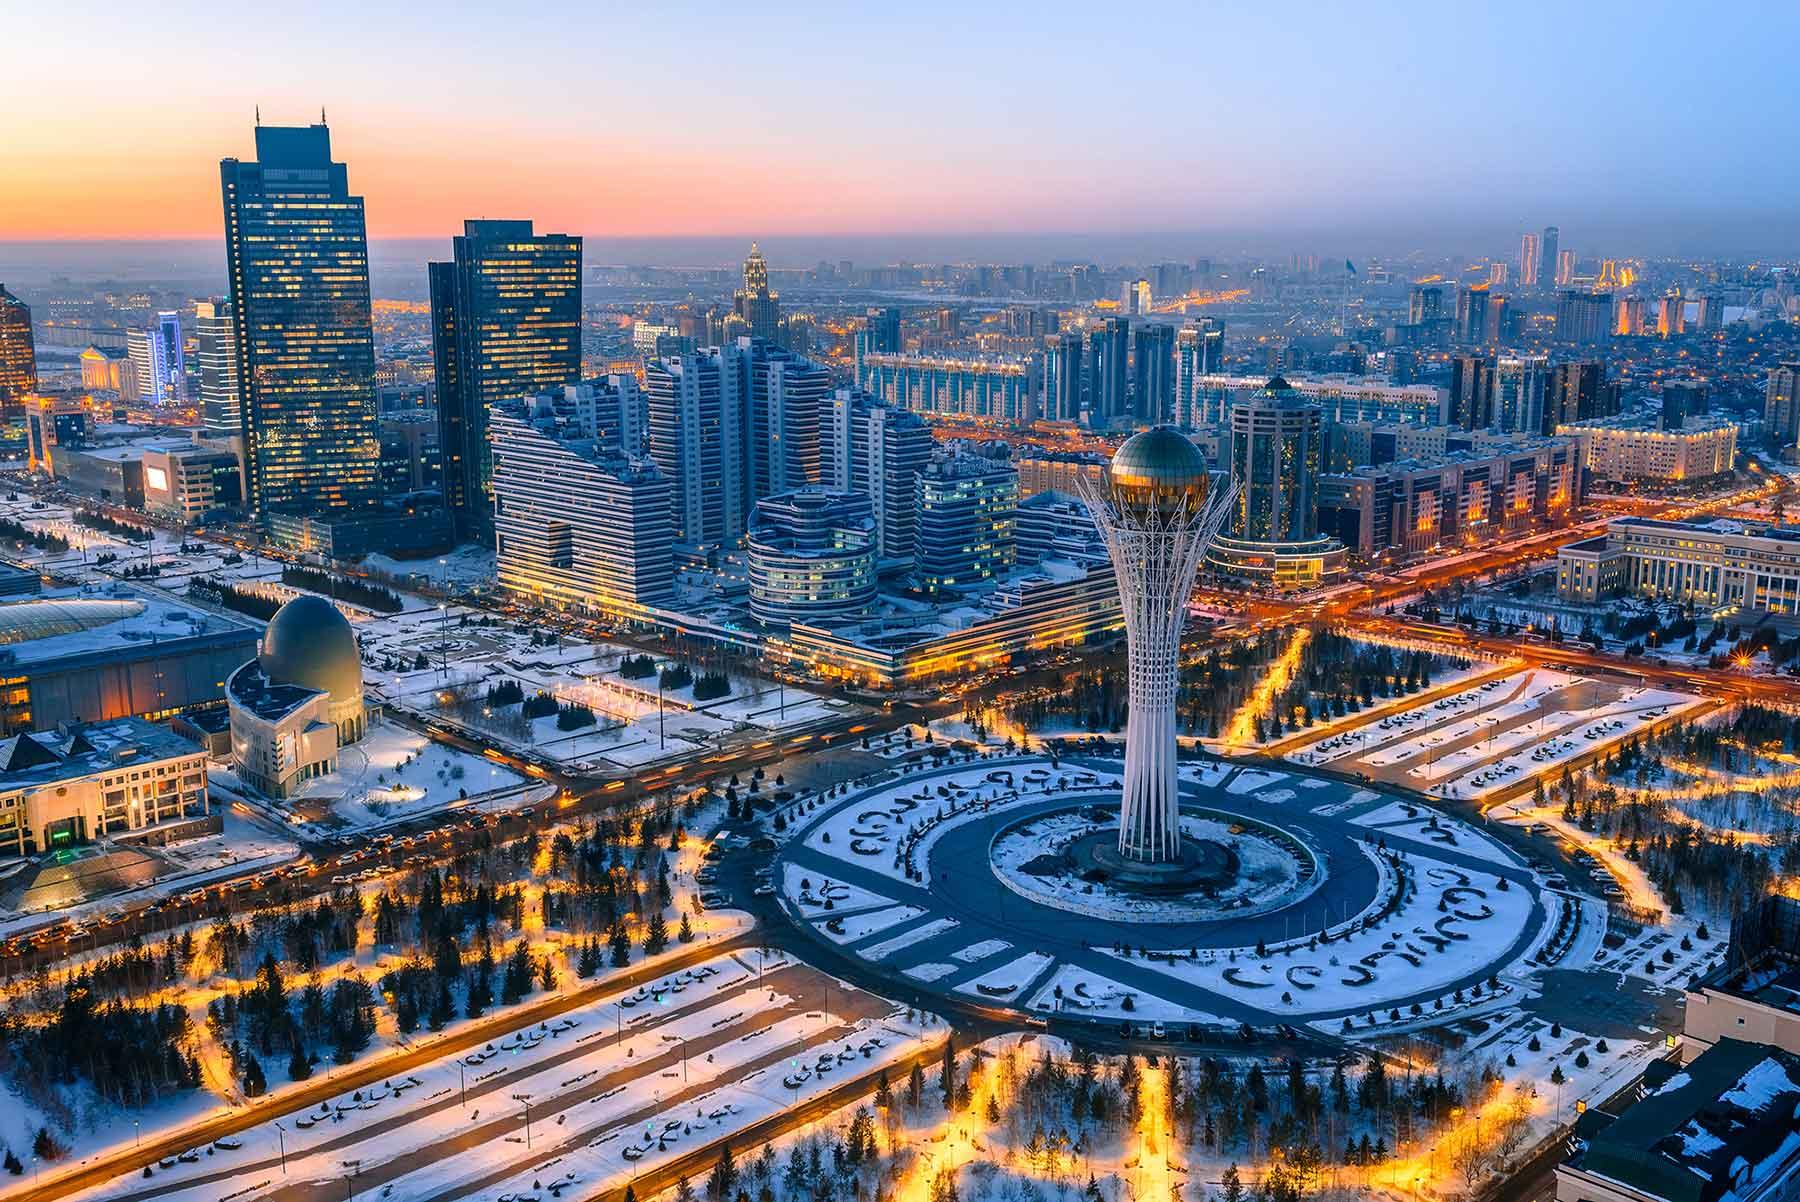 Kazakhstan International Tourism Exhibition in Astana